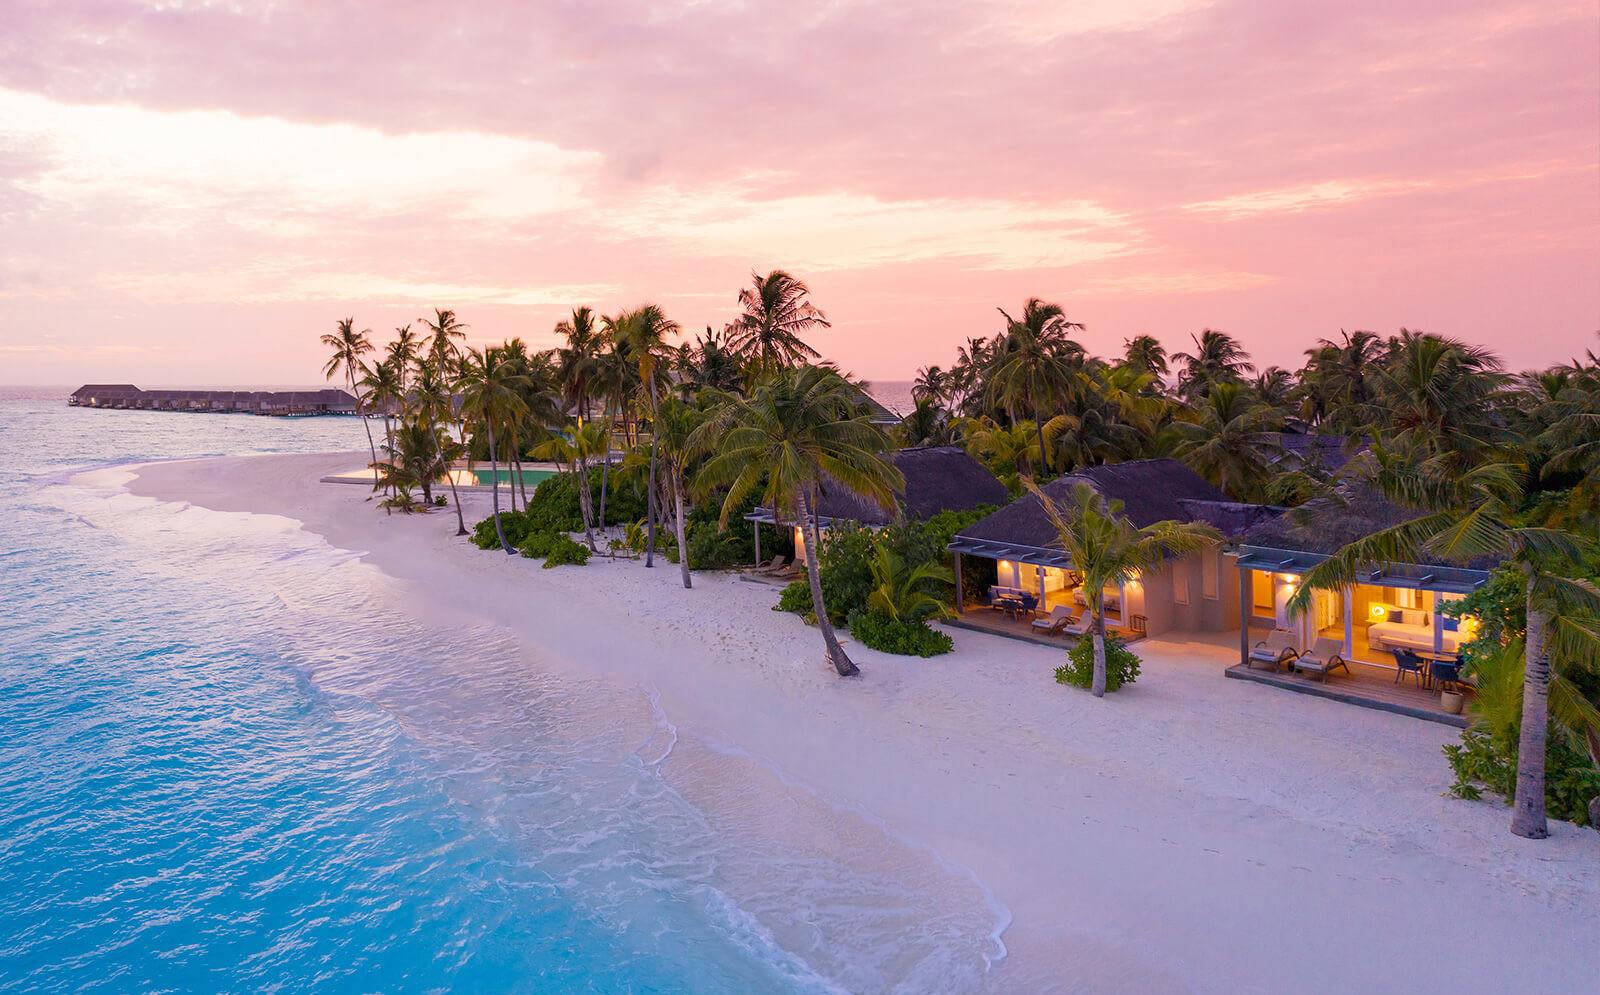 news-main-baglioni-maldives-celebrates-italian-excellence-with-borsalino.1619085998.jpg